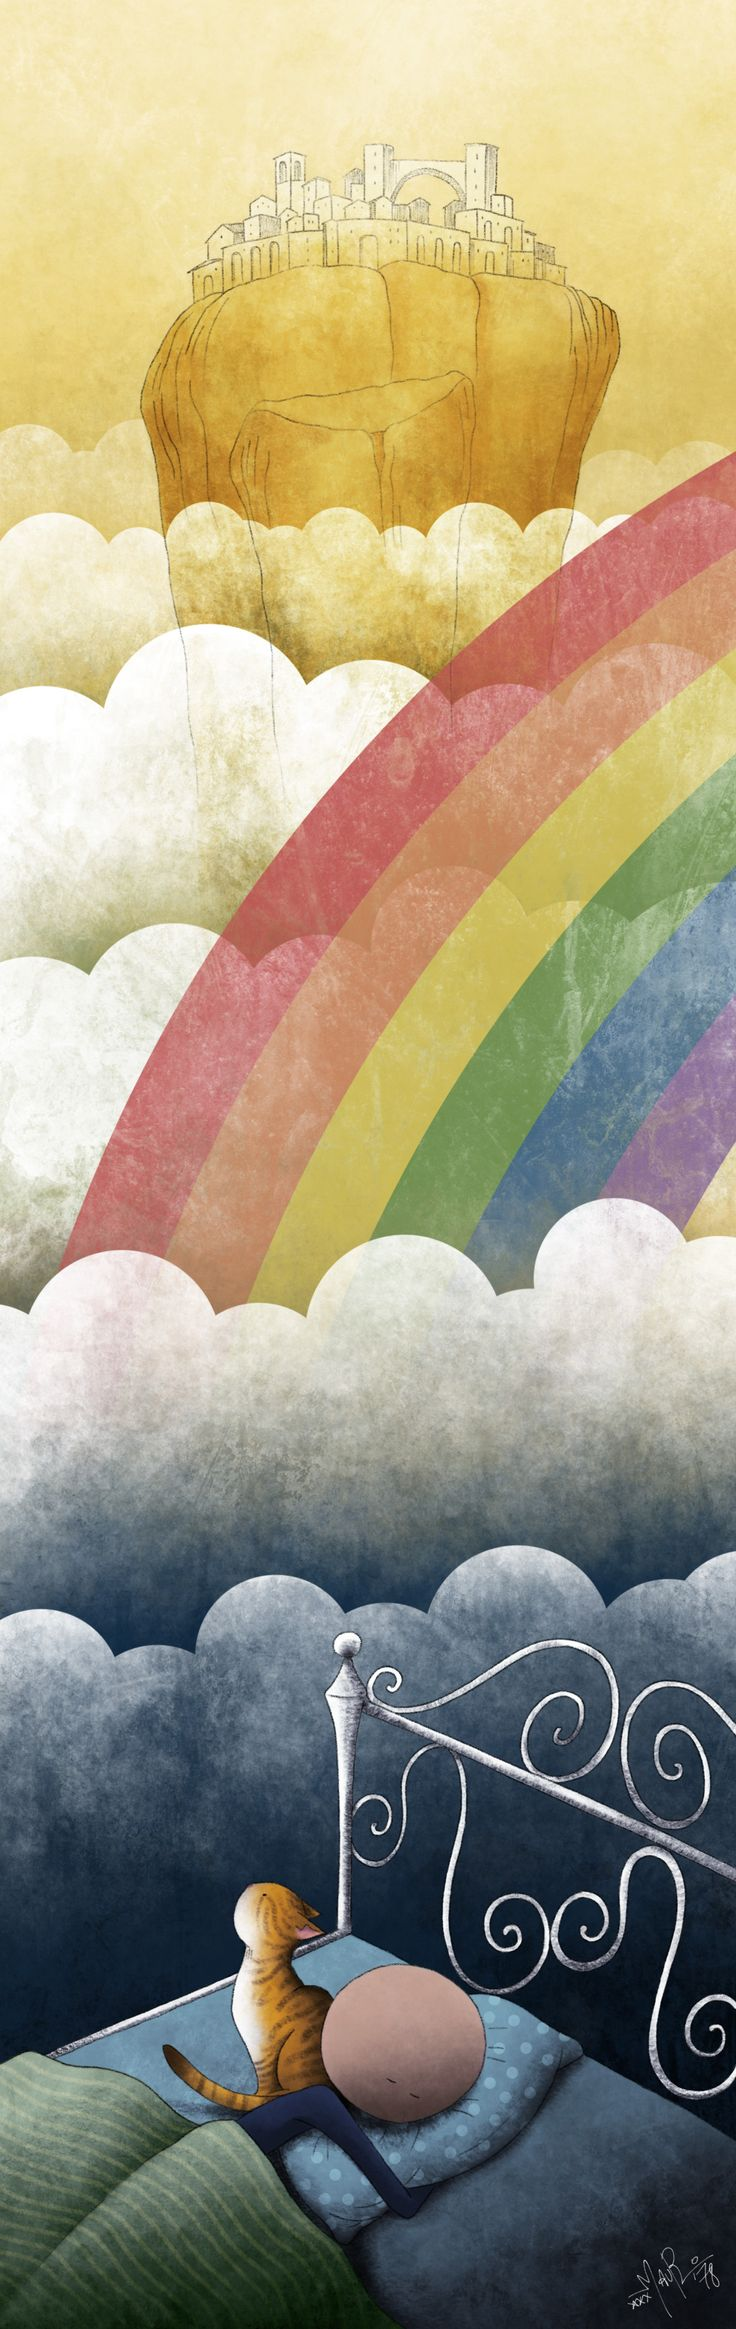 "Mauro Falcioni ~ The Paper-Cat Illustrations || Il paese sopra l'arcobaleno ~ ""Cantami una ninna nanna e tingerò la notte."""